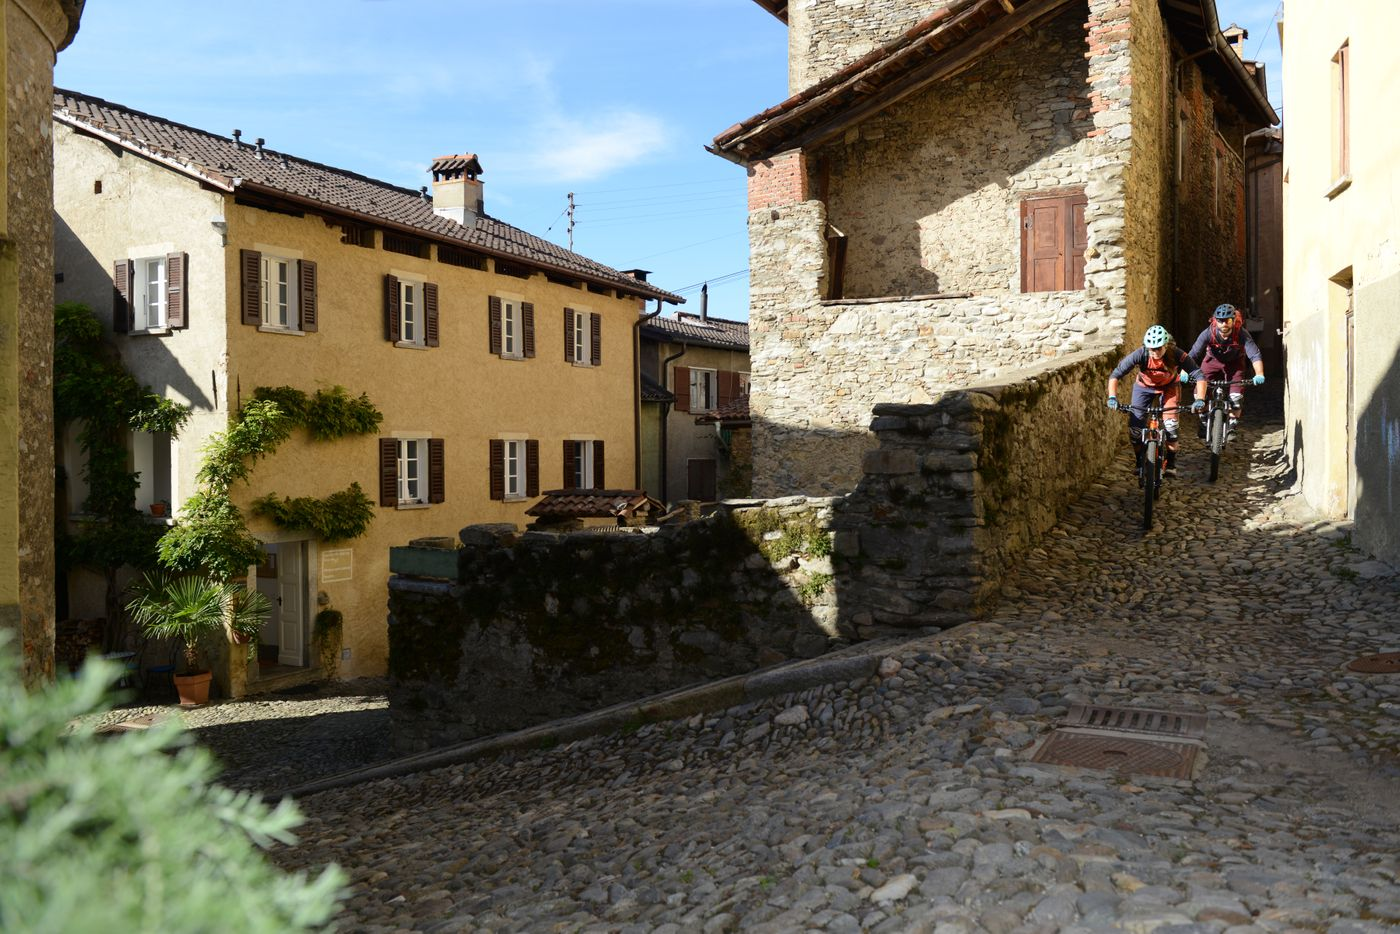 Biken in Lugano - 14